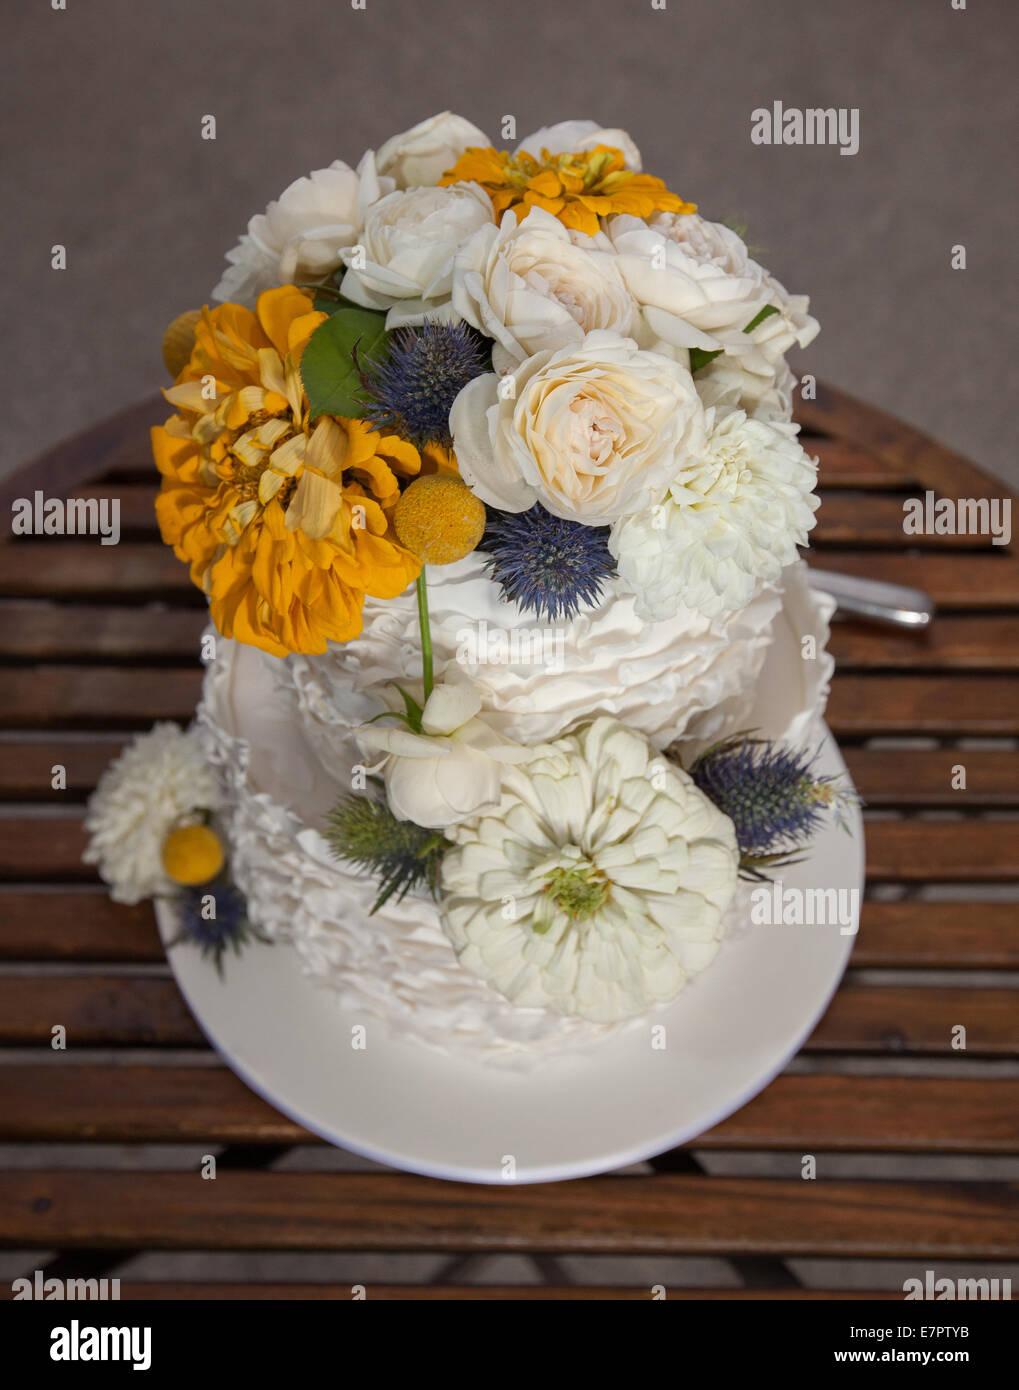 Wedding Cake Australia Stock Photo 73646591 Alamy